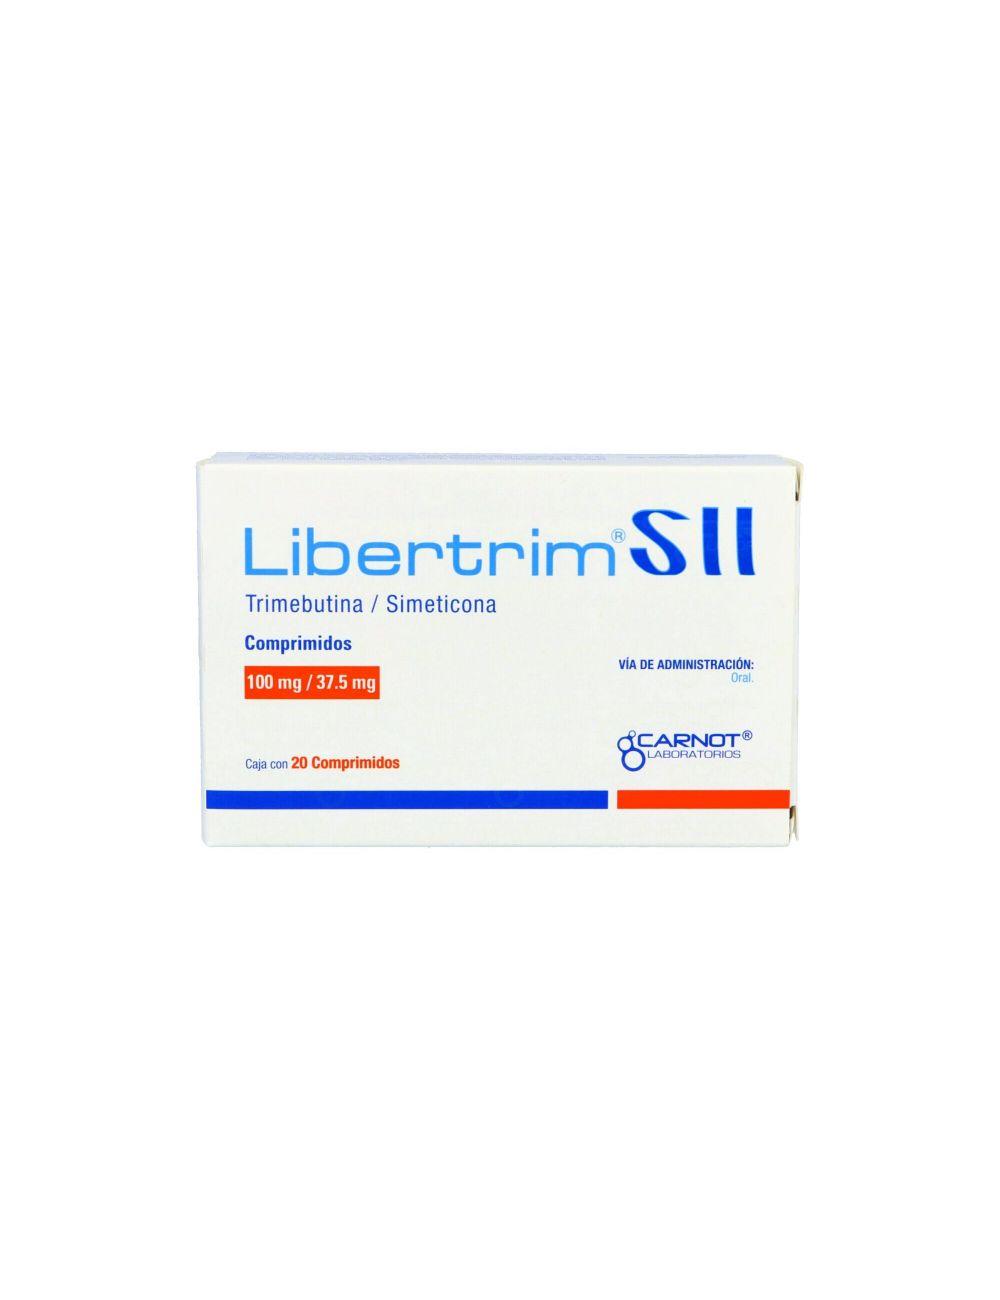 Libertrim SII 100 mg / 37.5 mg Caja Con 20 Comprimidos